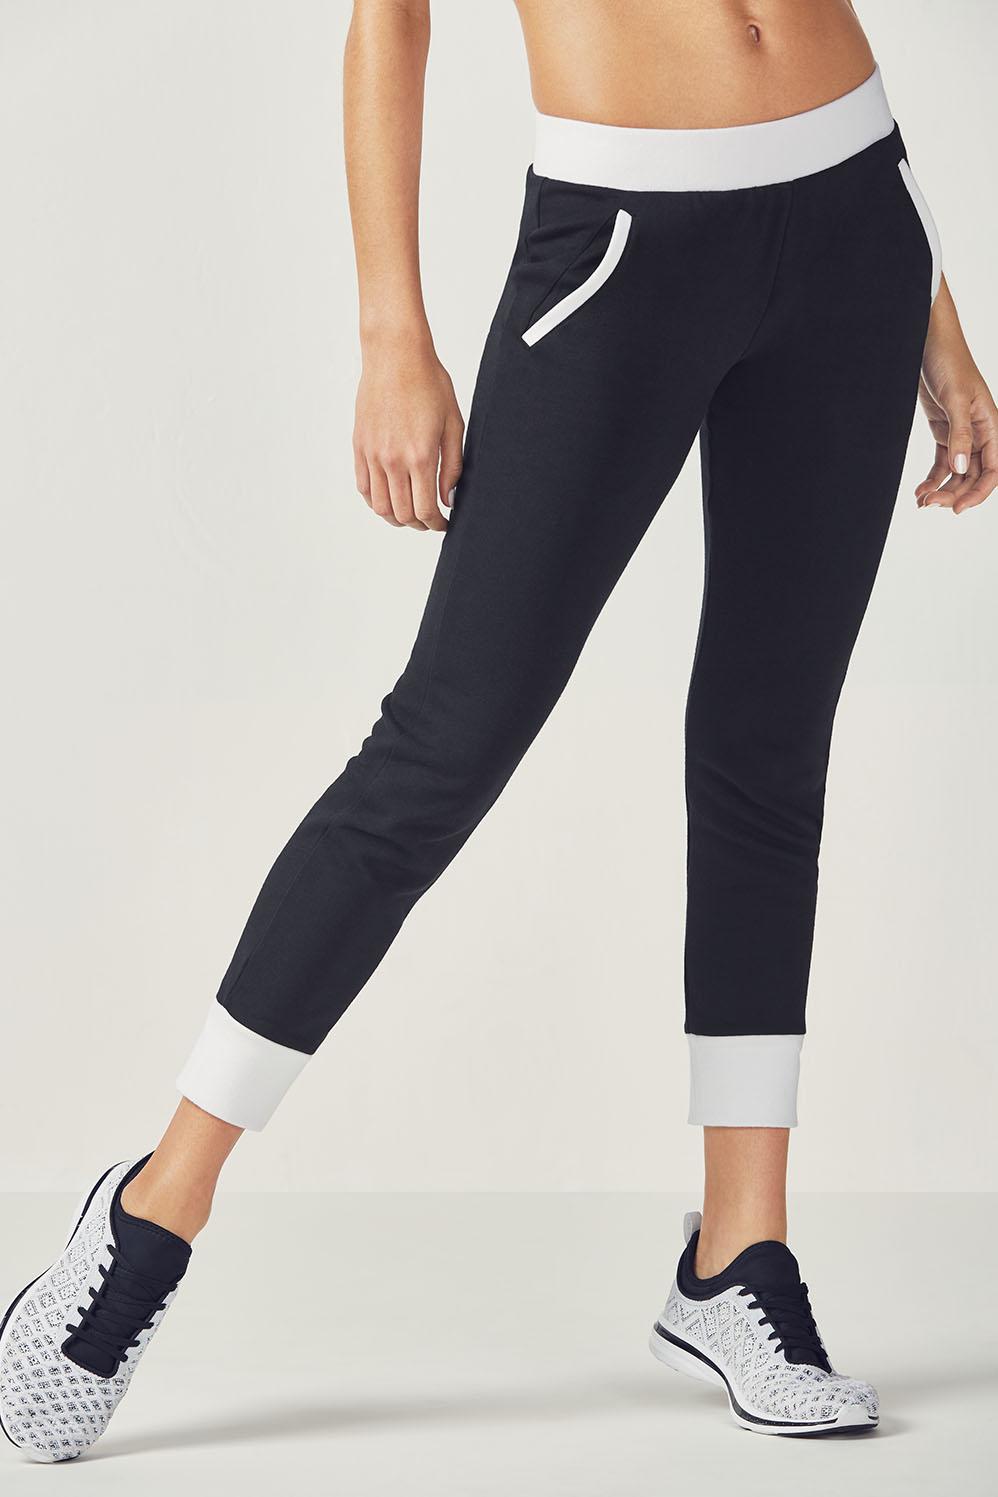 Fabletics Andi Jogger Pants Womens Black/White Size S